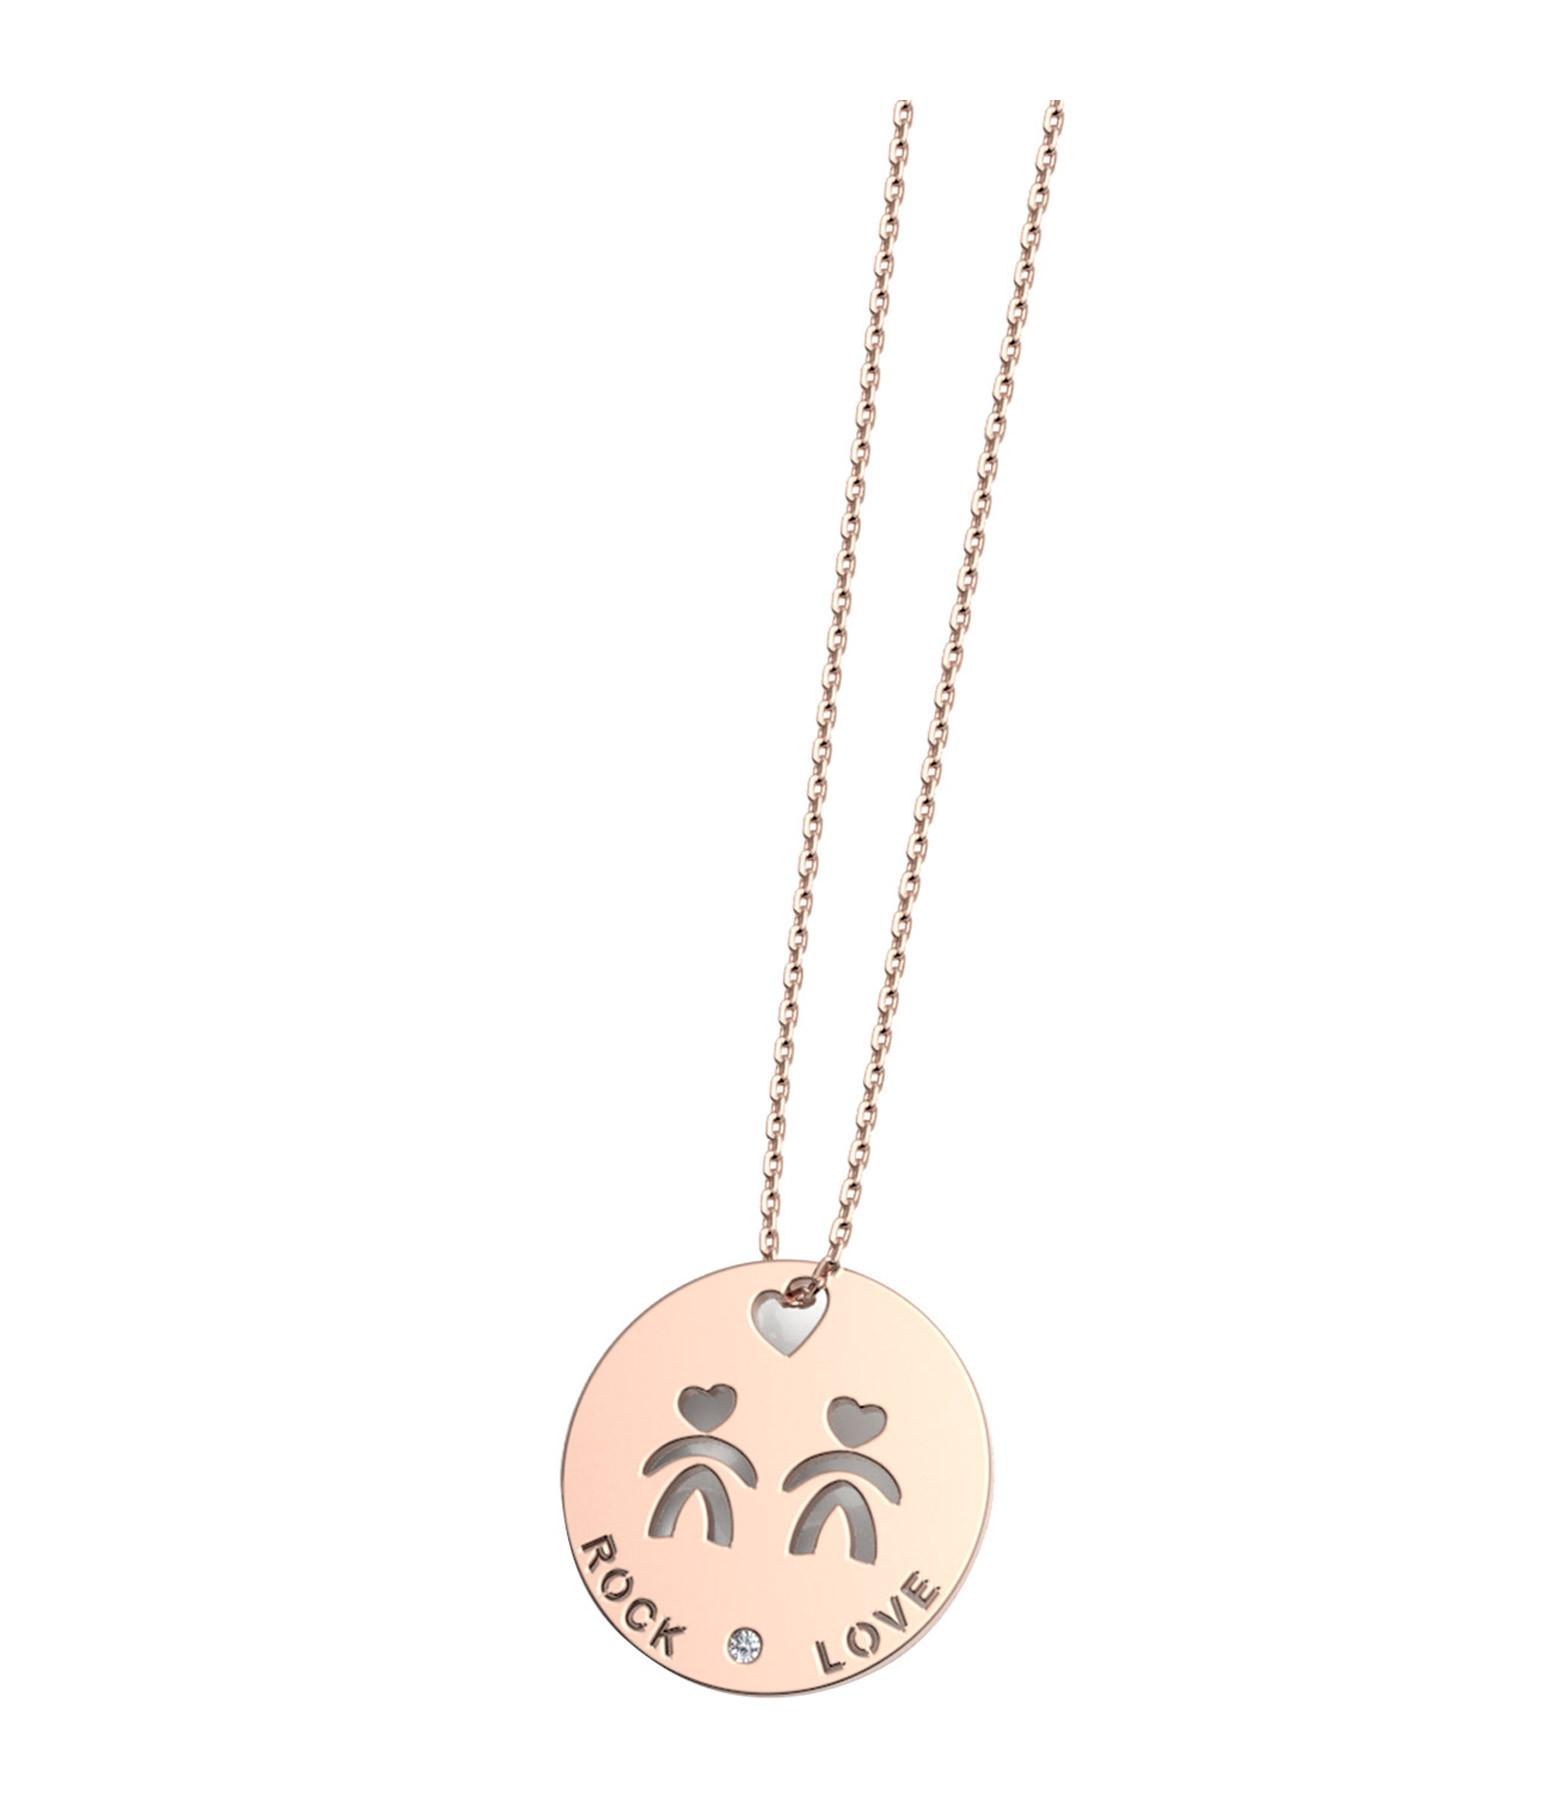 NAVA JOAILLERIE - Collier Horosco-Rock Gémeau Diamants Or